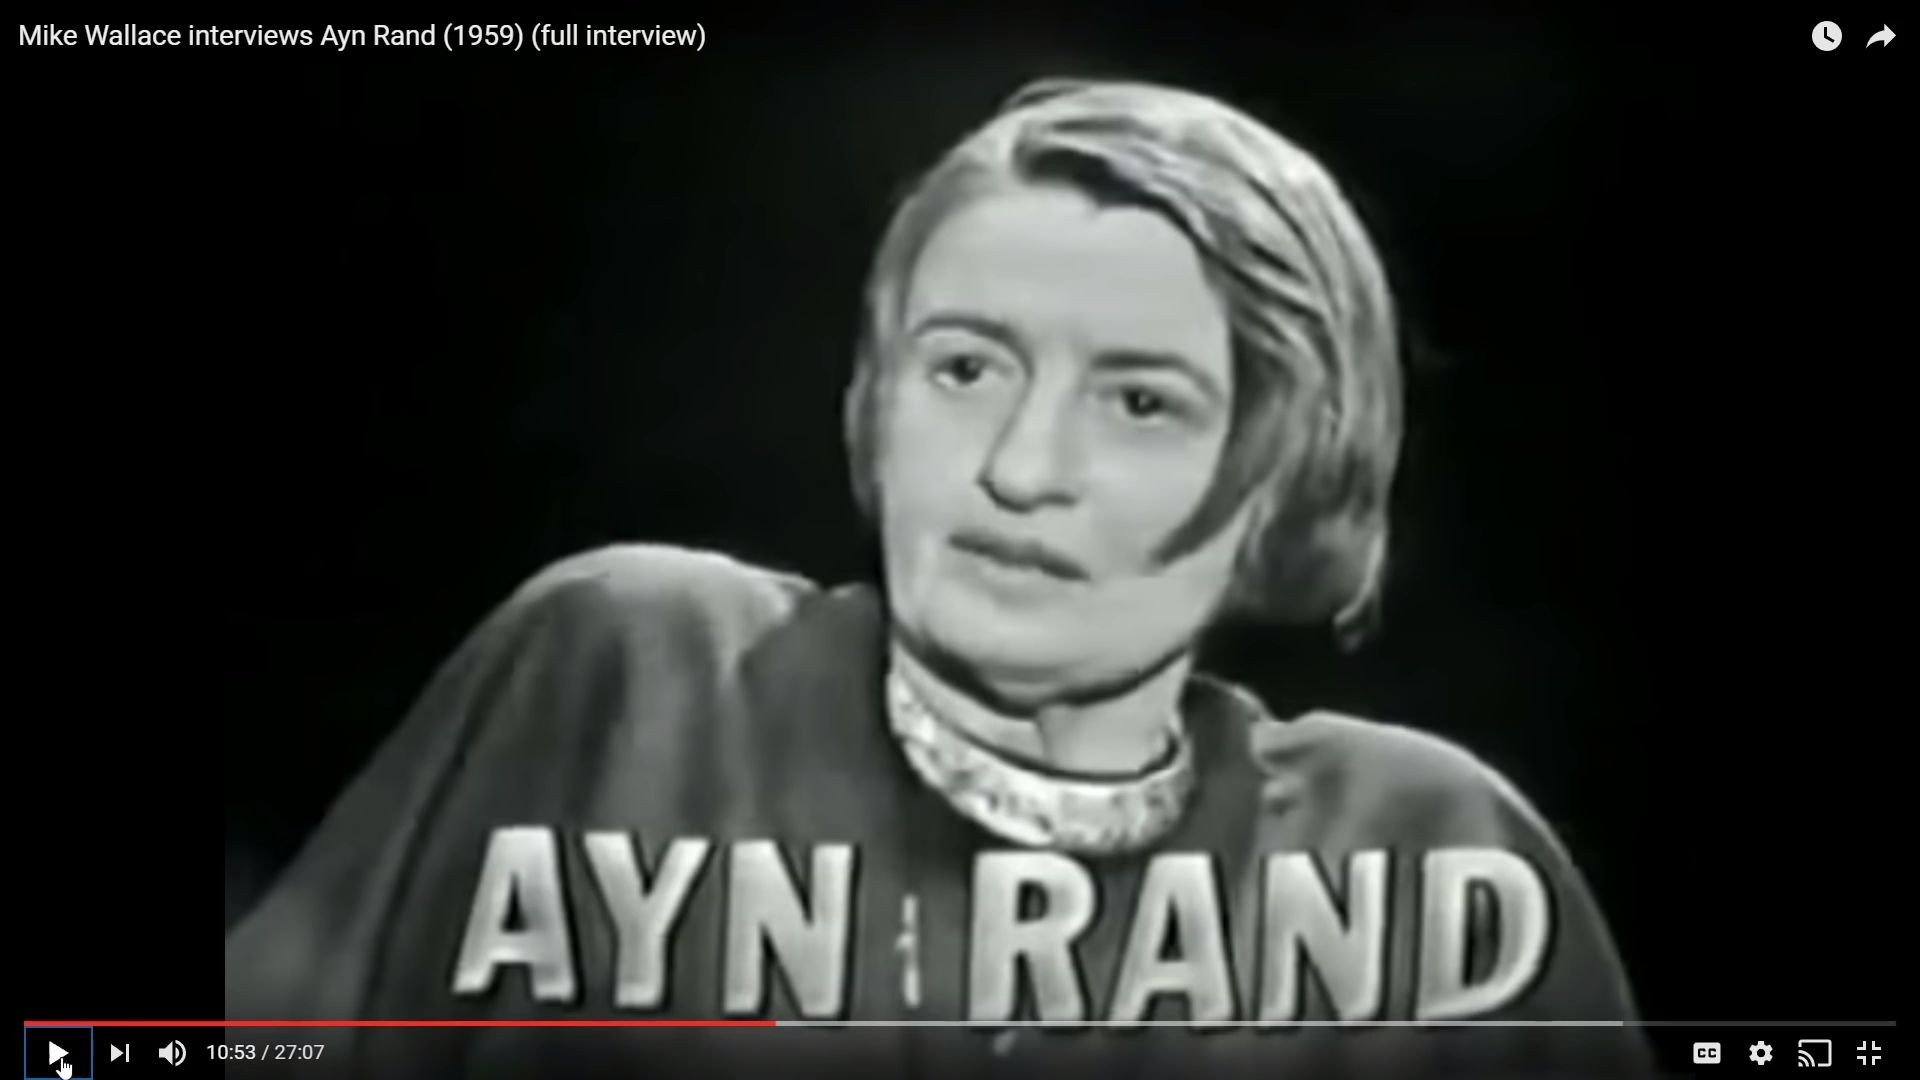 Body Language - Ayn Rand